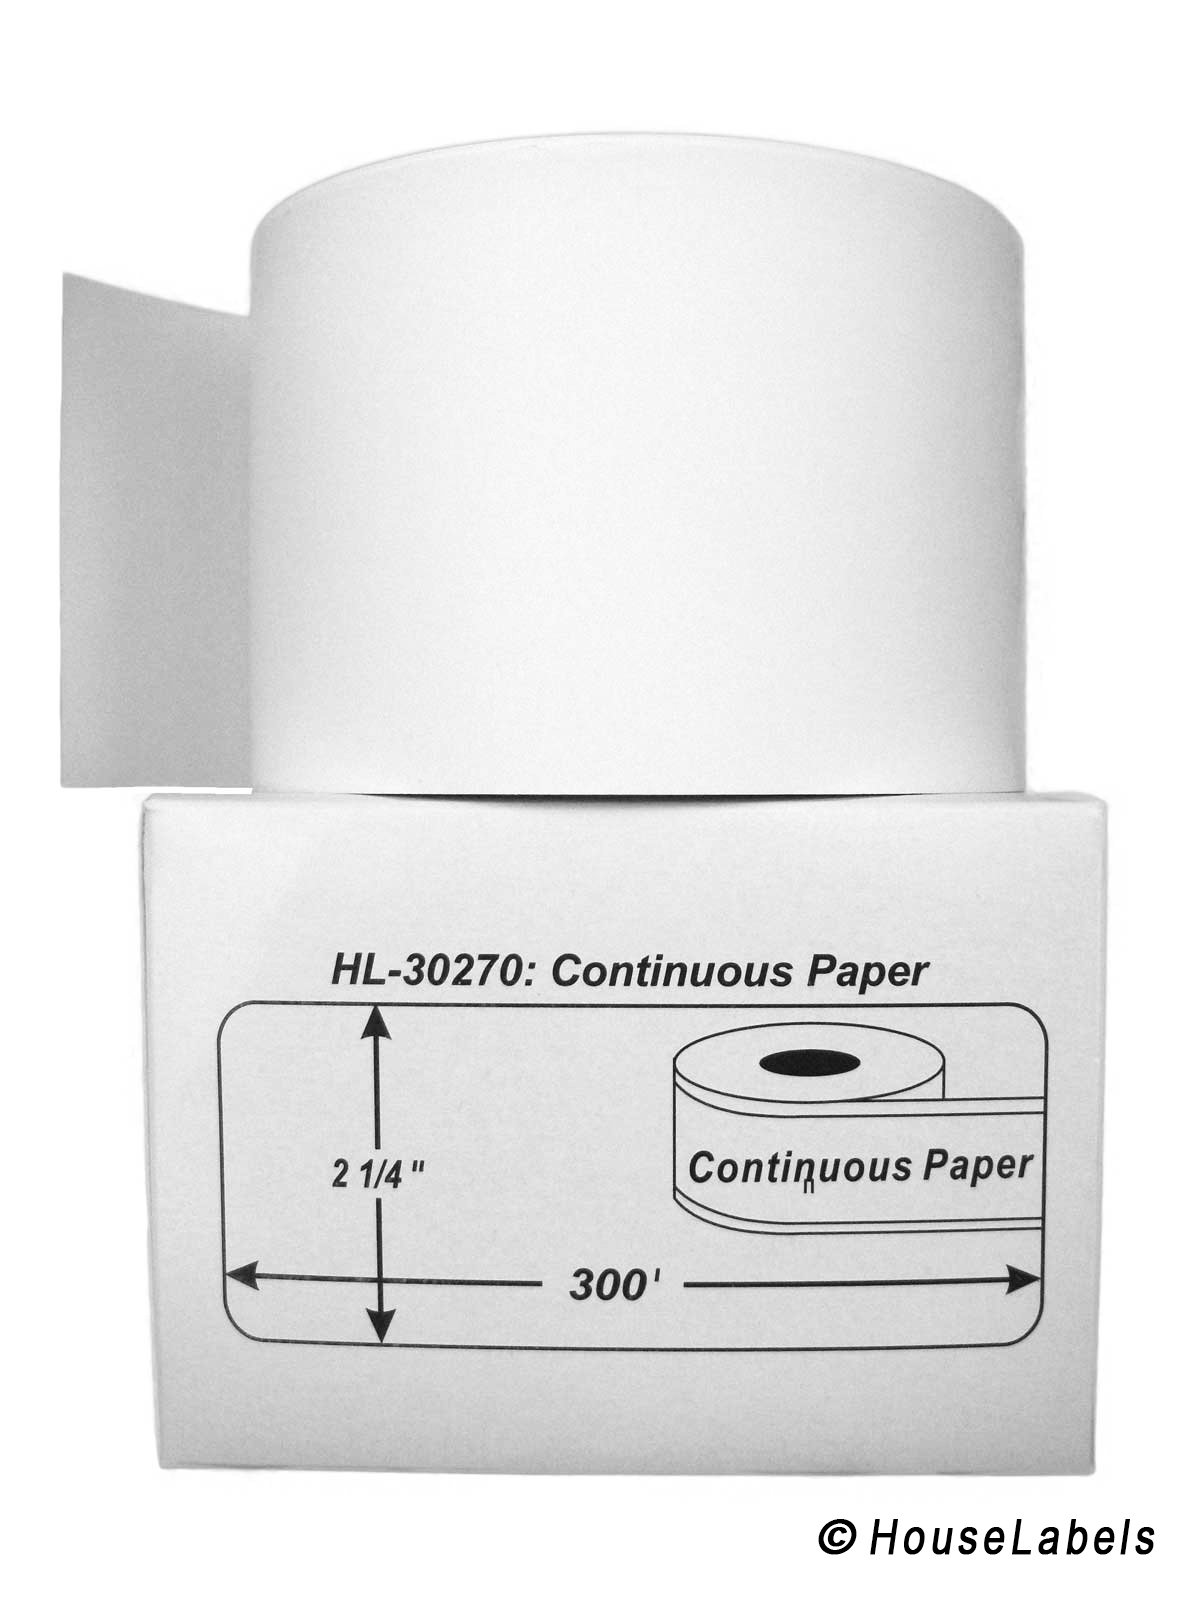 25 Rolls; Continuous Paper, DYMO-Compatible 30270 Continuous Receipt Paper (2-7/16'' x 300') -- BPA Free!